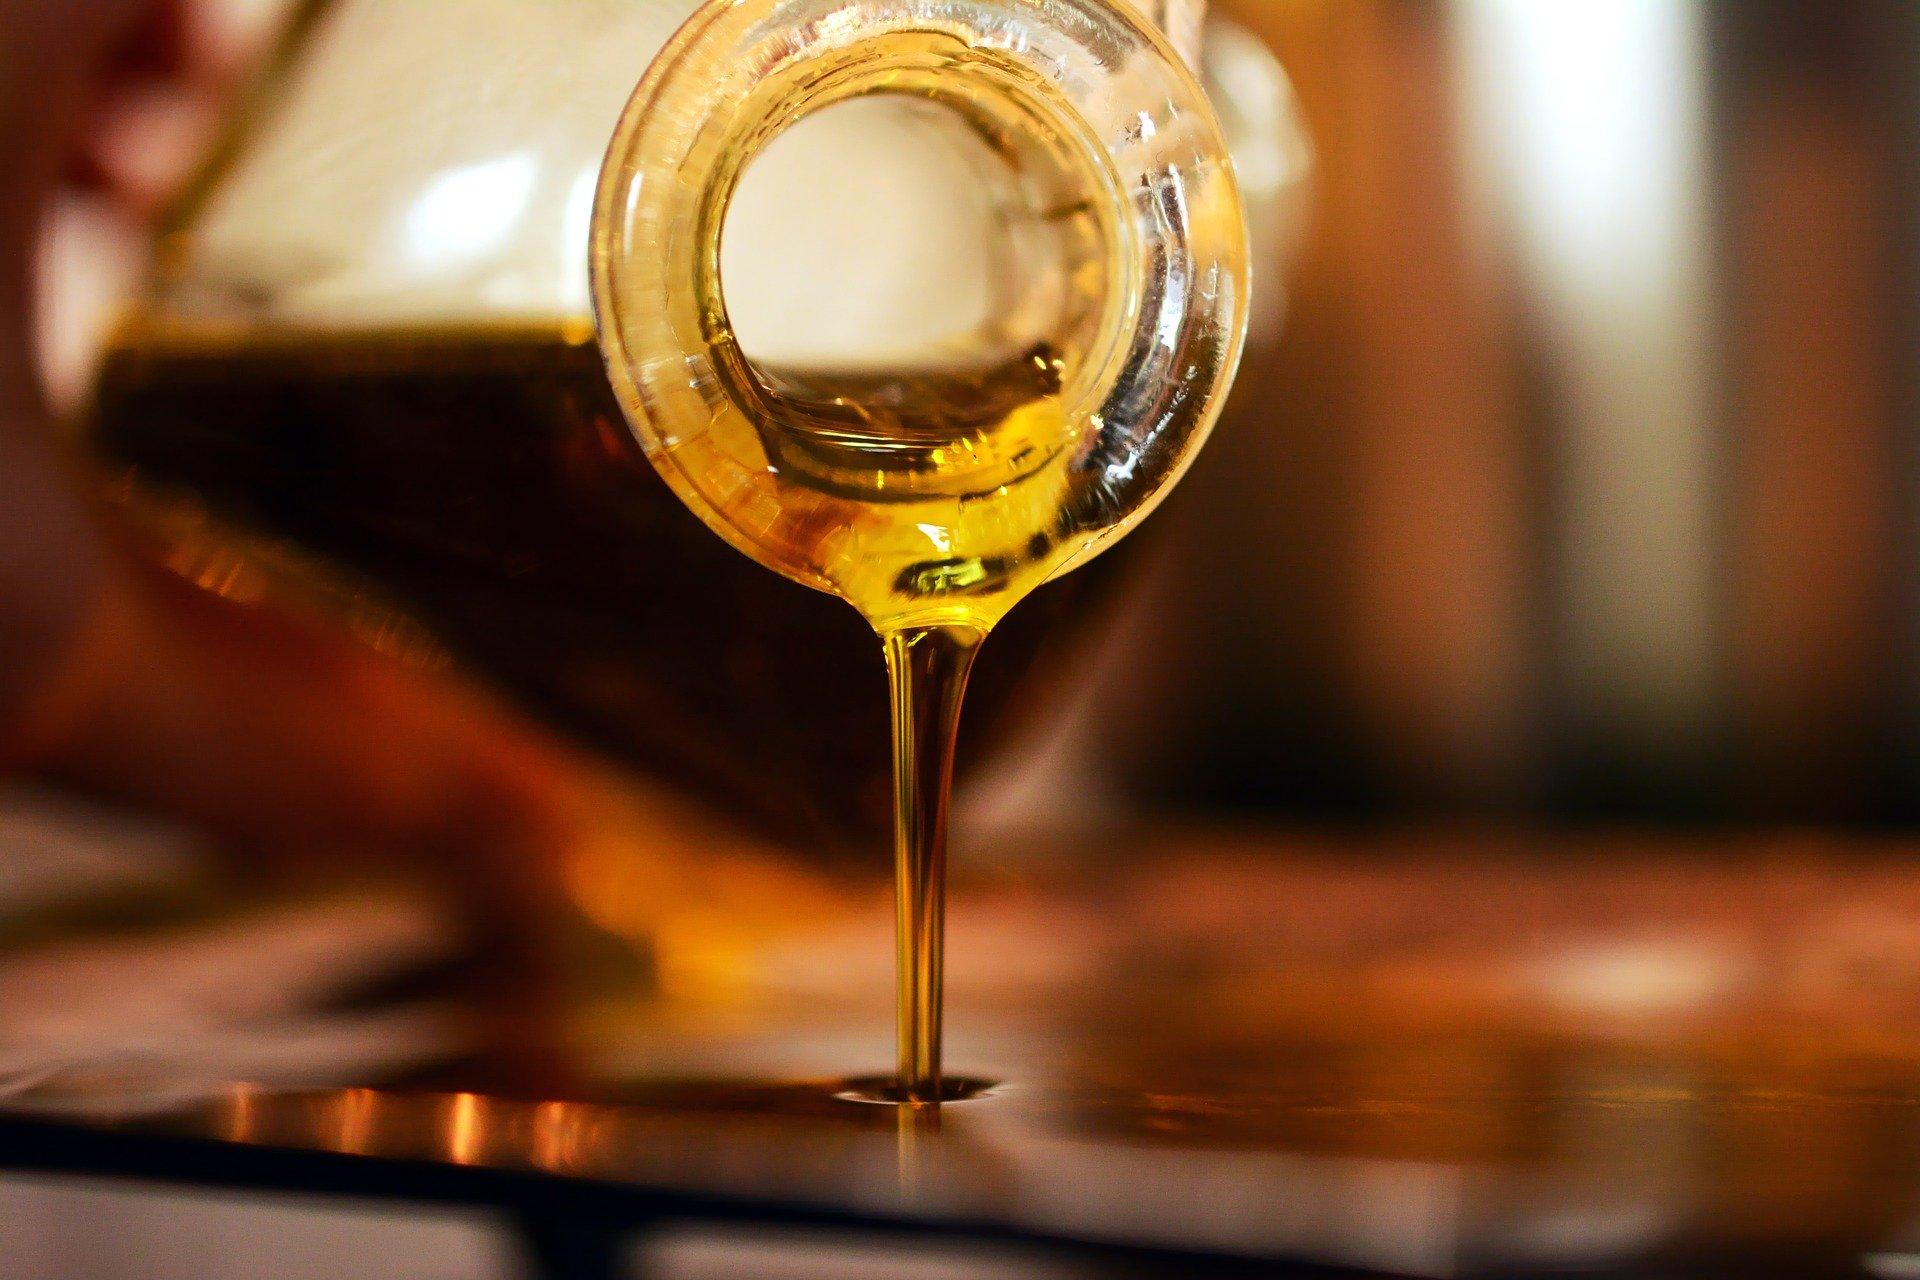 come conservare l'olio extravergine d'oliva